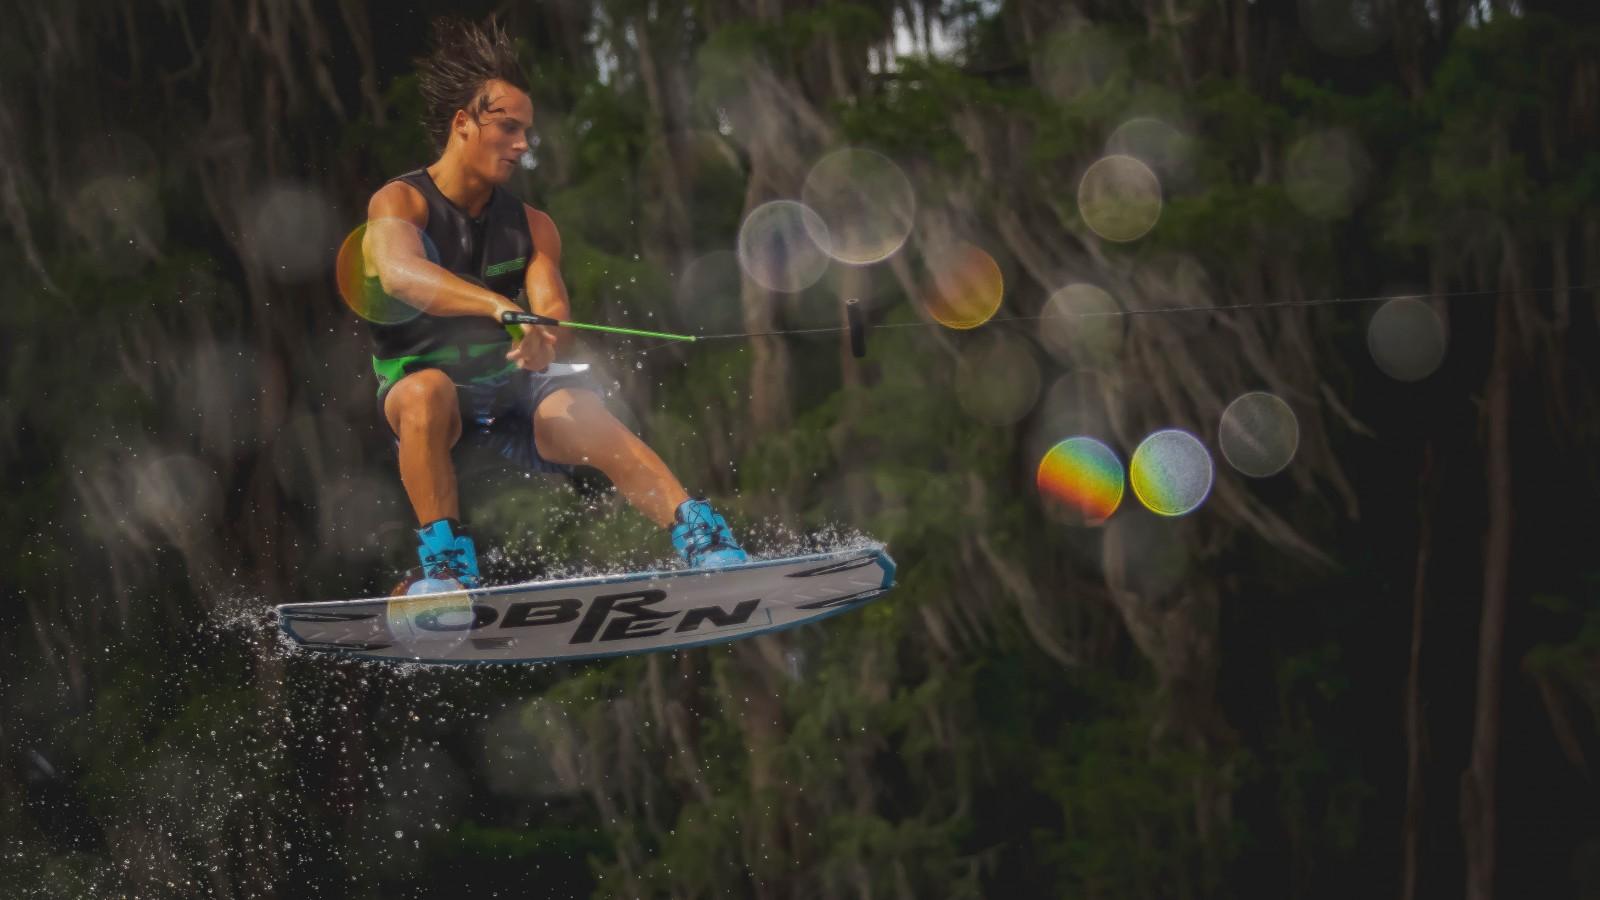 Cory Teunissen Wakeboard